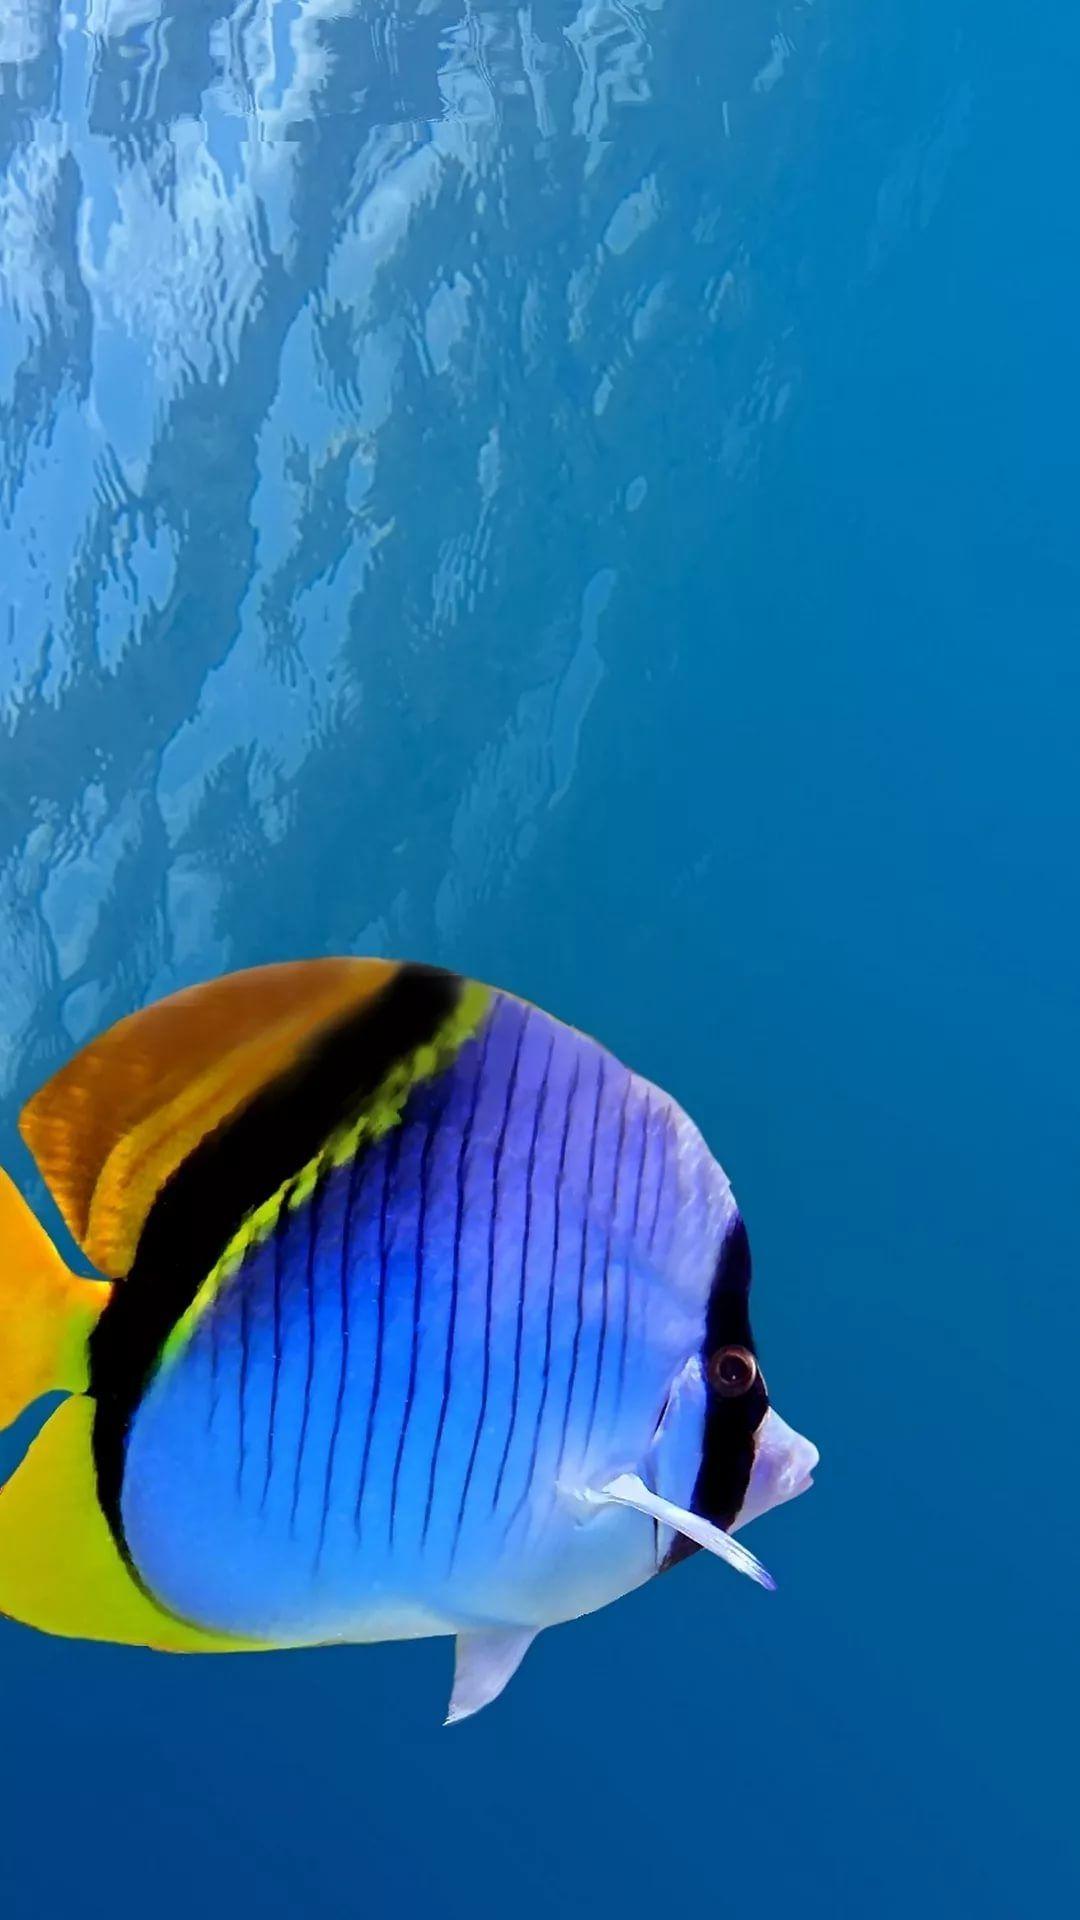 Fish s9 wallpaper